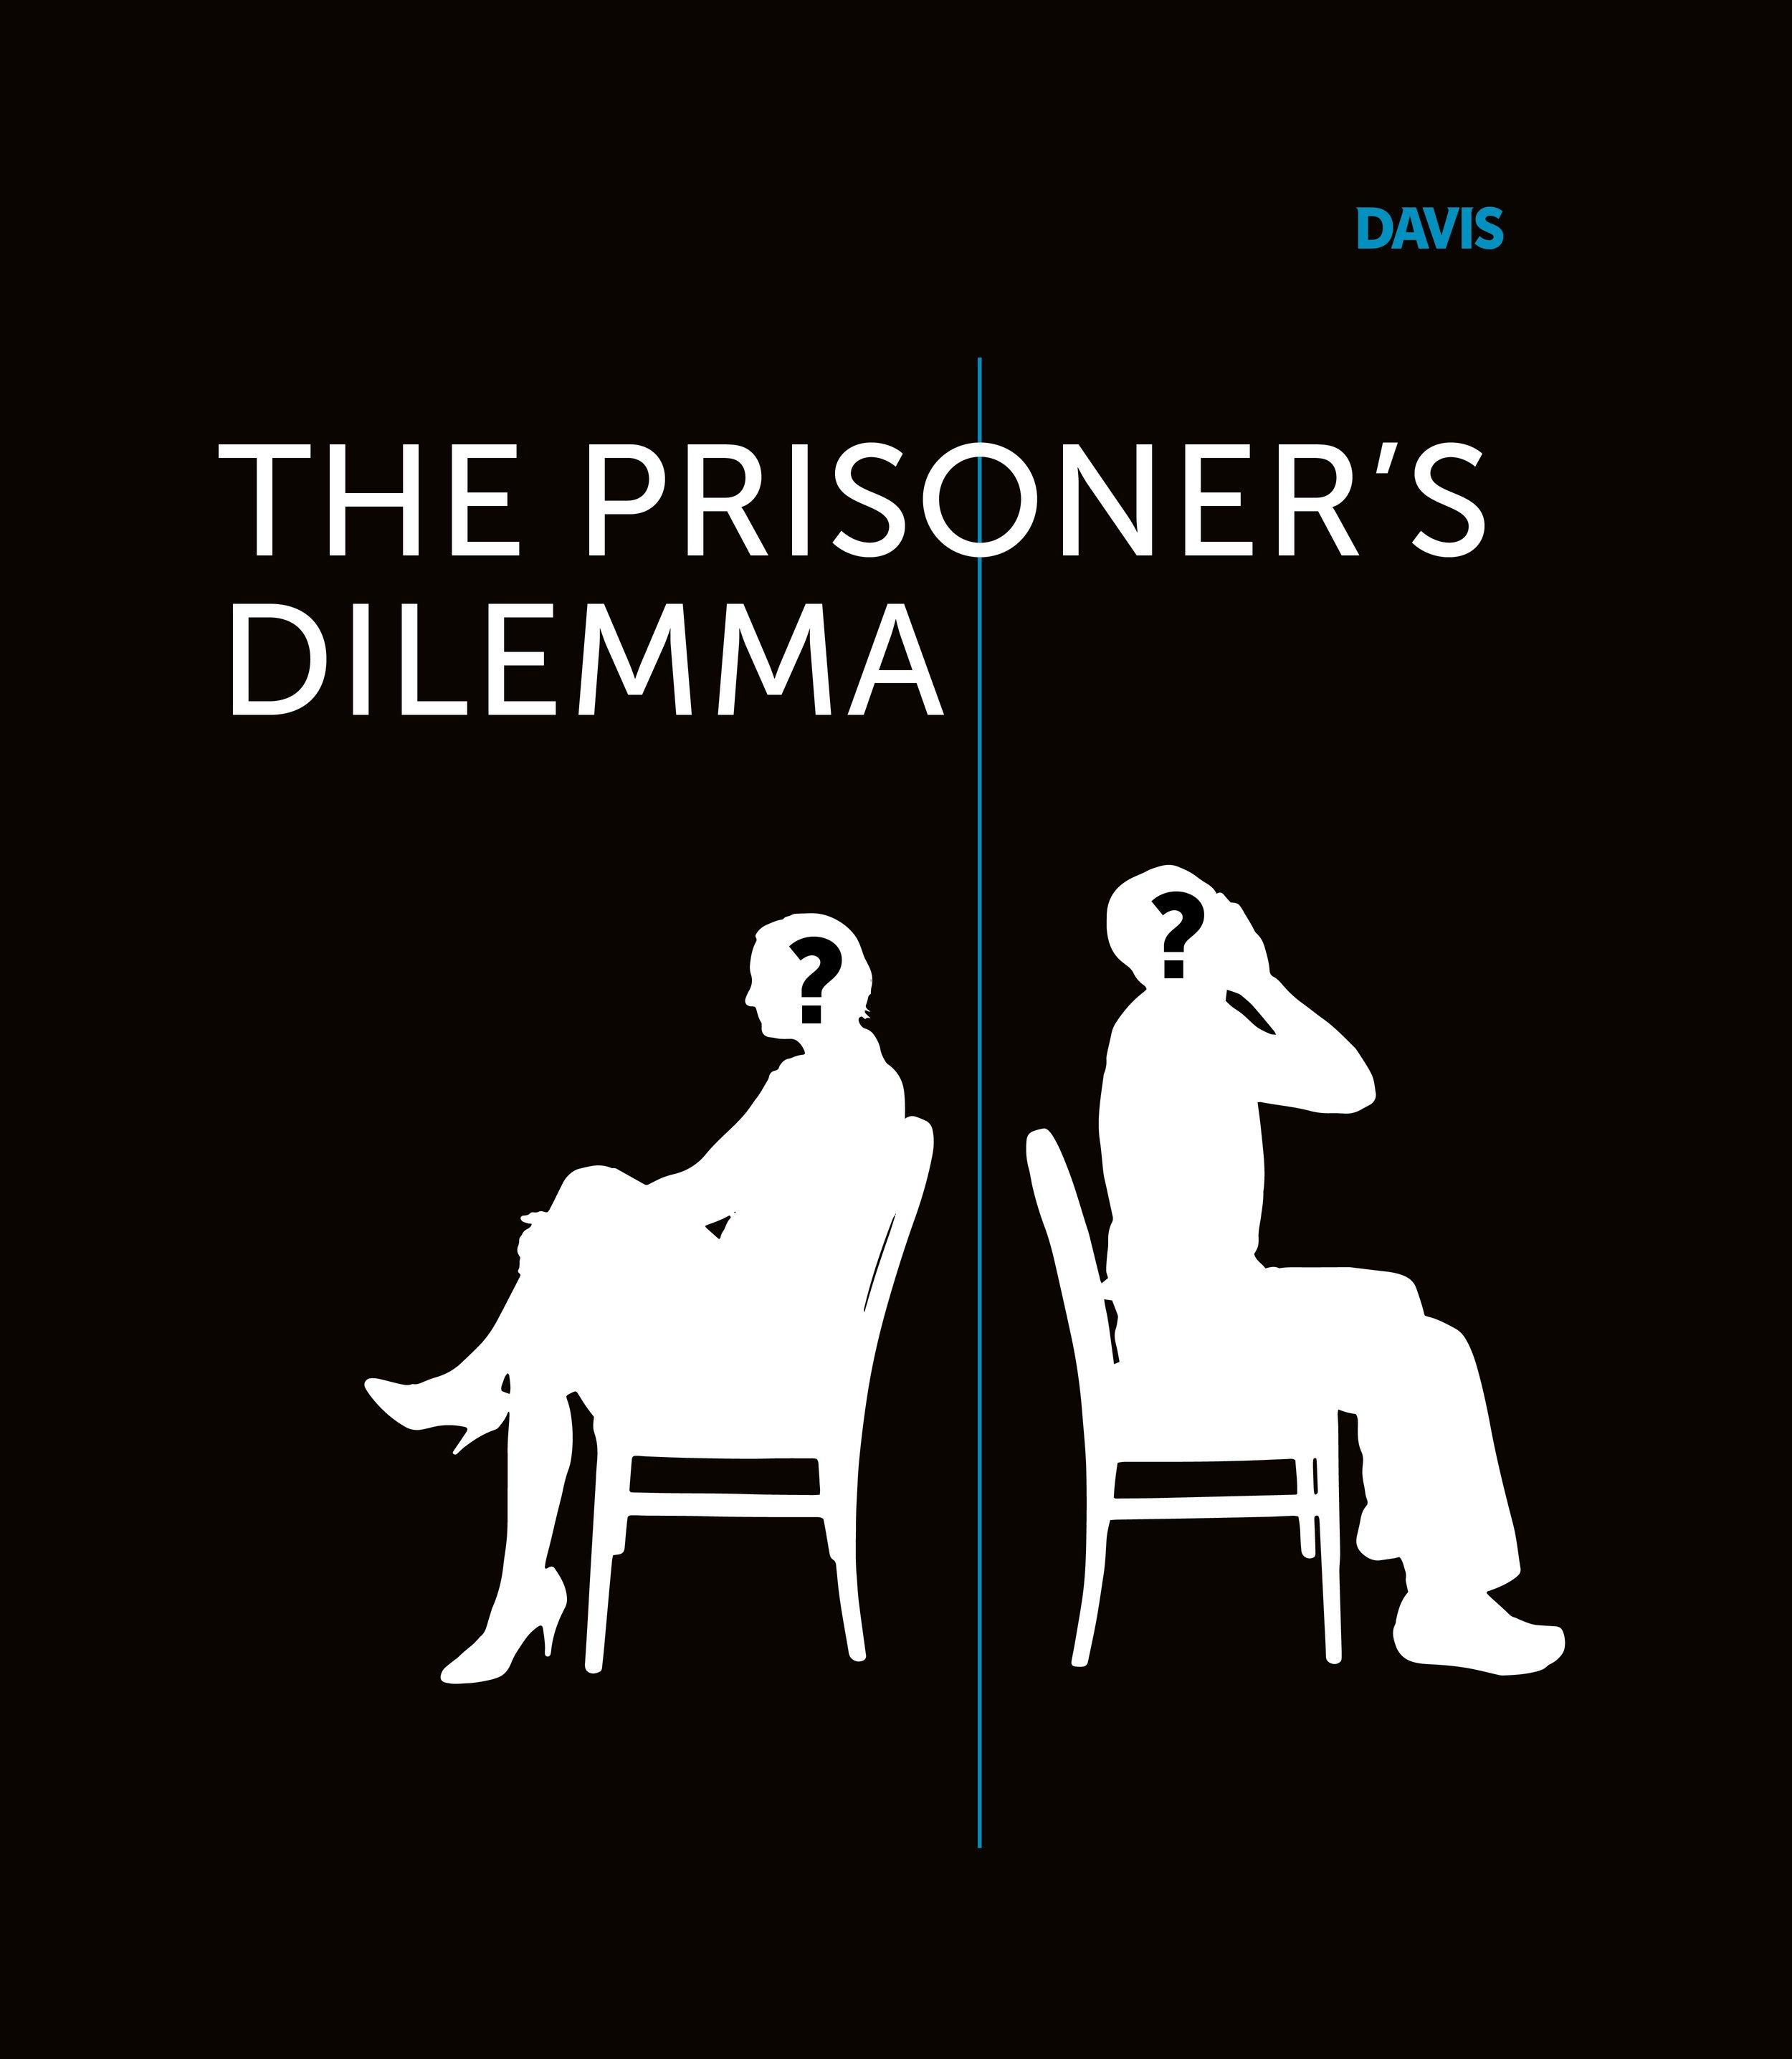 davis-dramatic-simplicity-prisoners-dilemma